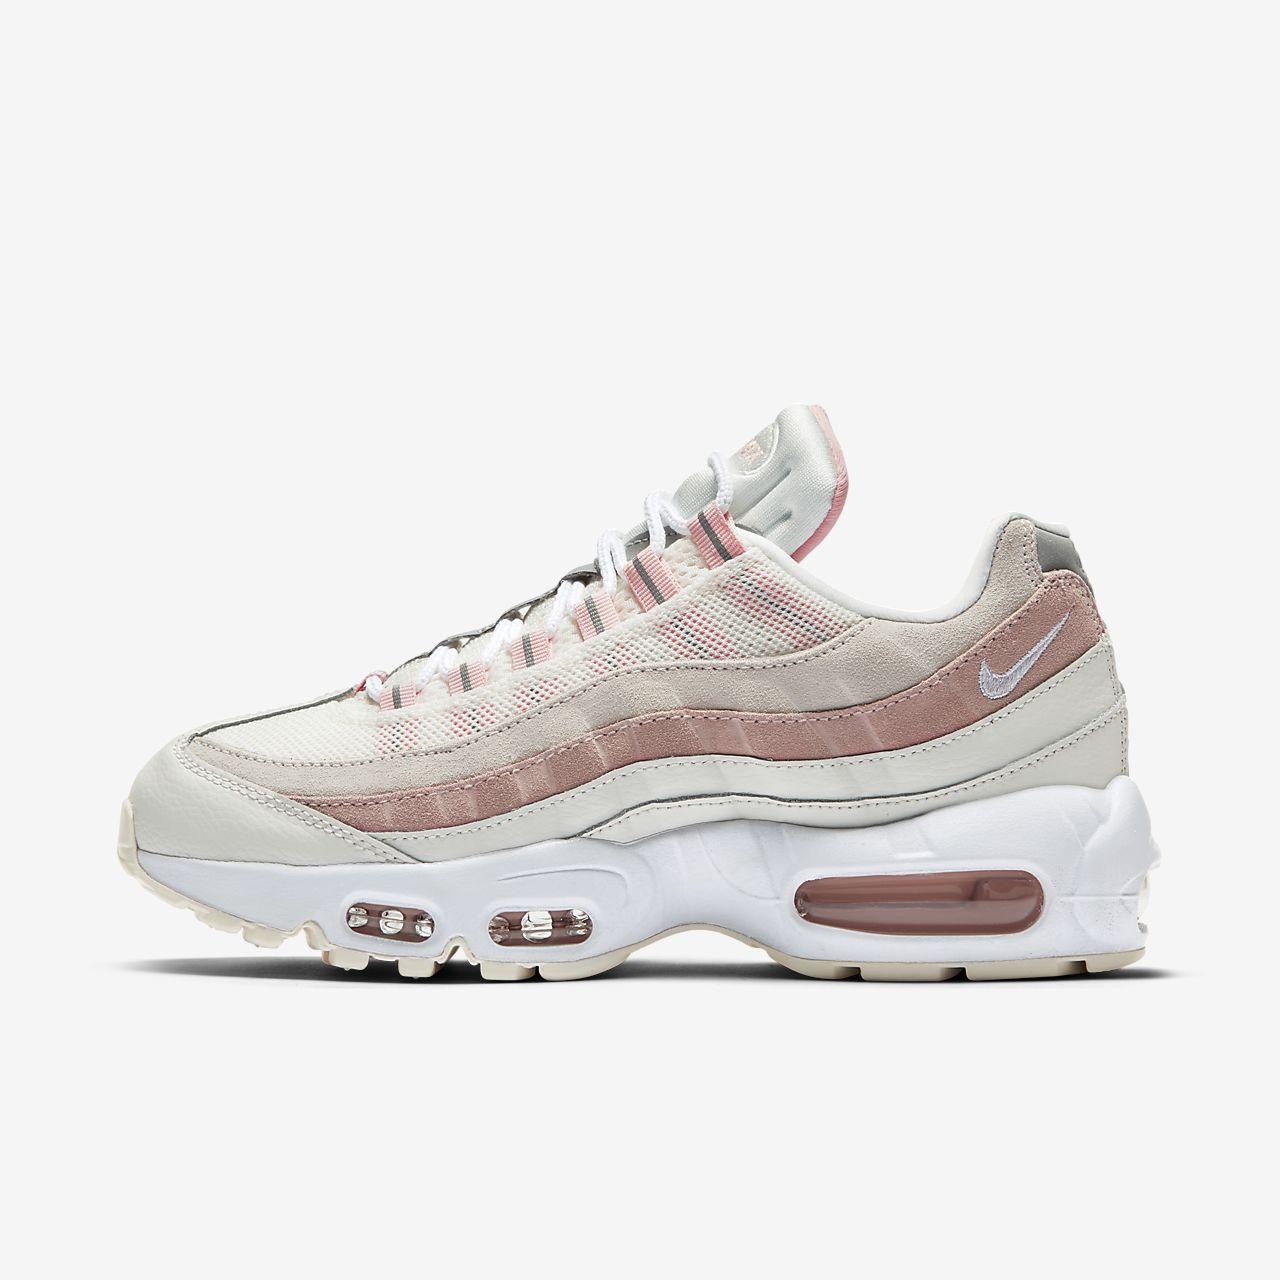 online retailer bfa75 e1277 Nike Air Max 95 Women's Shoe